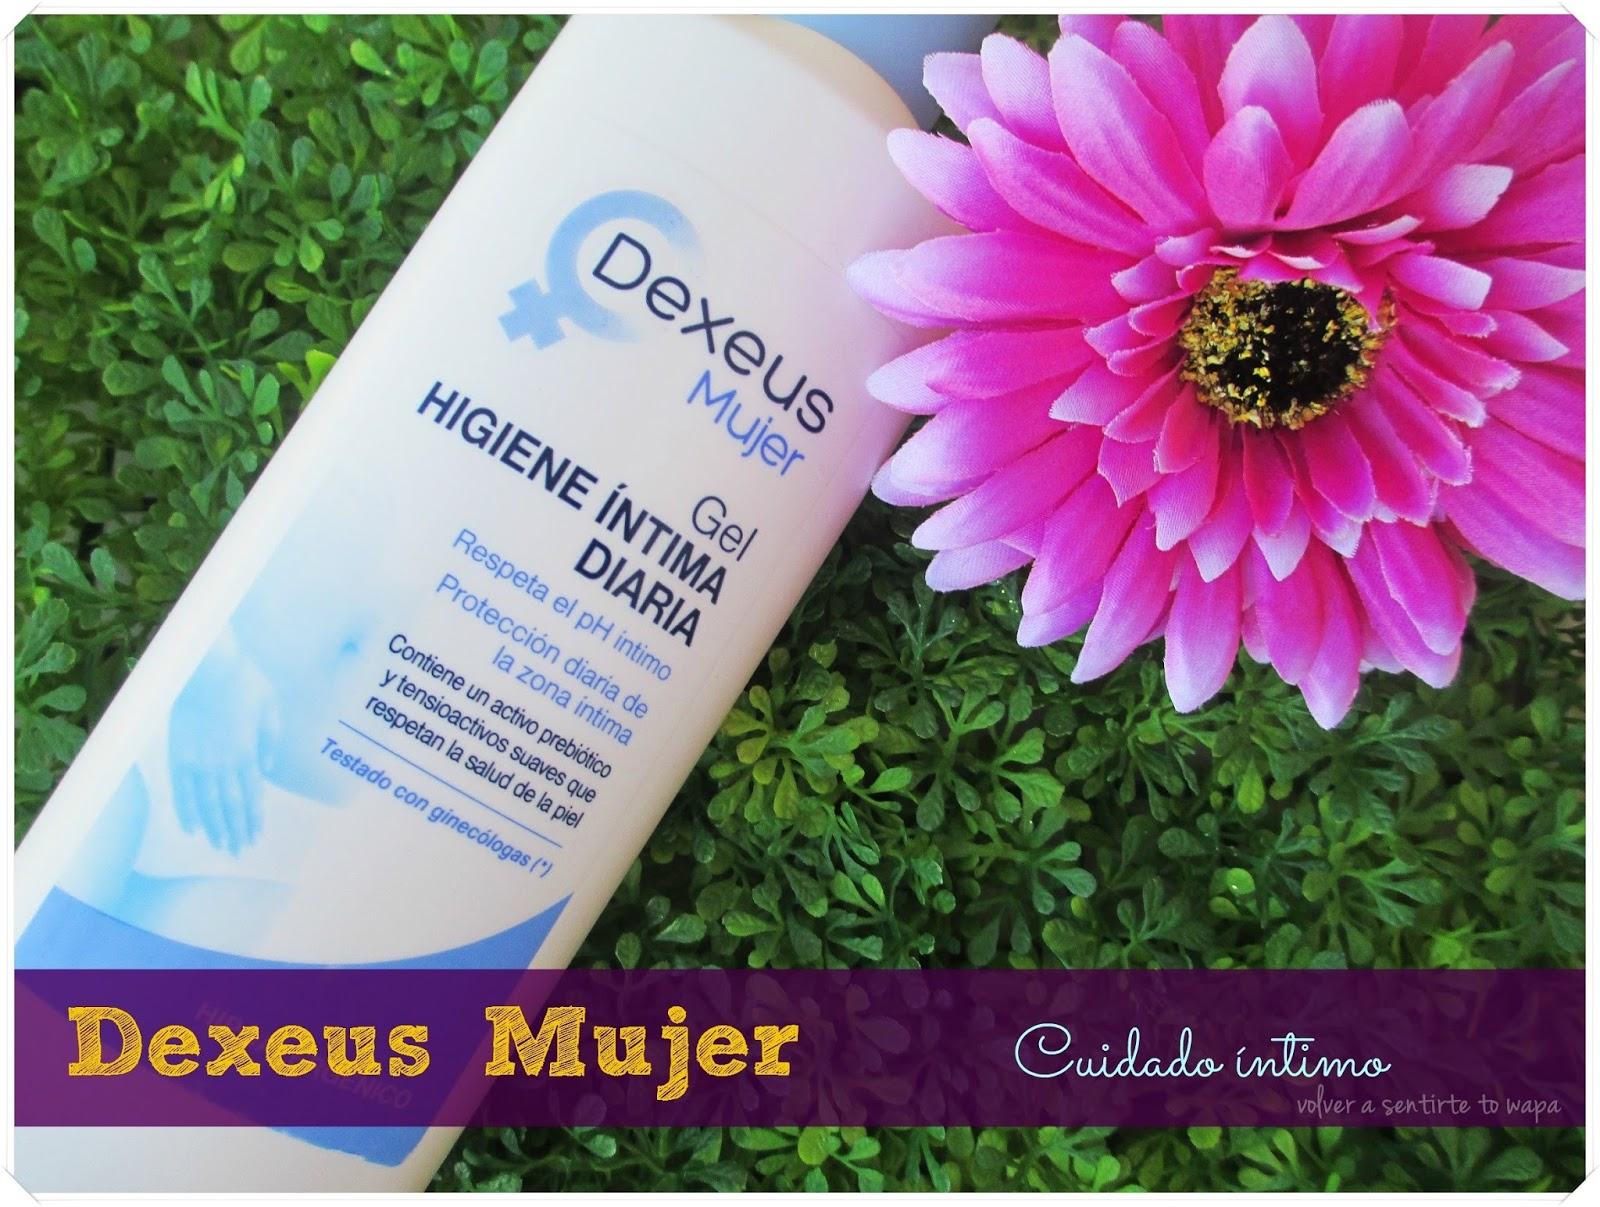 Cuidado íntimo - Dexeus Mujer Gel Higiene íntima diaria {review}